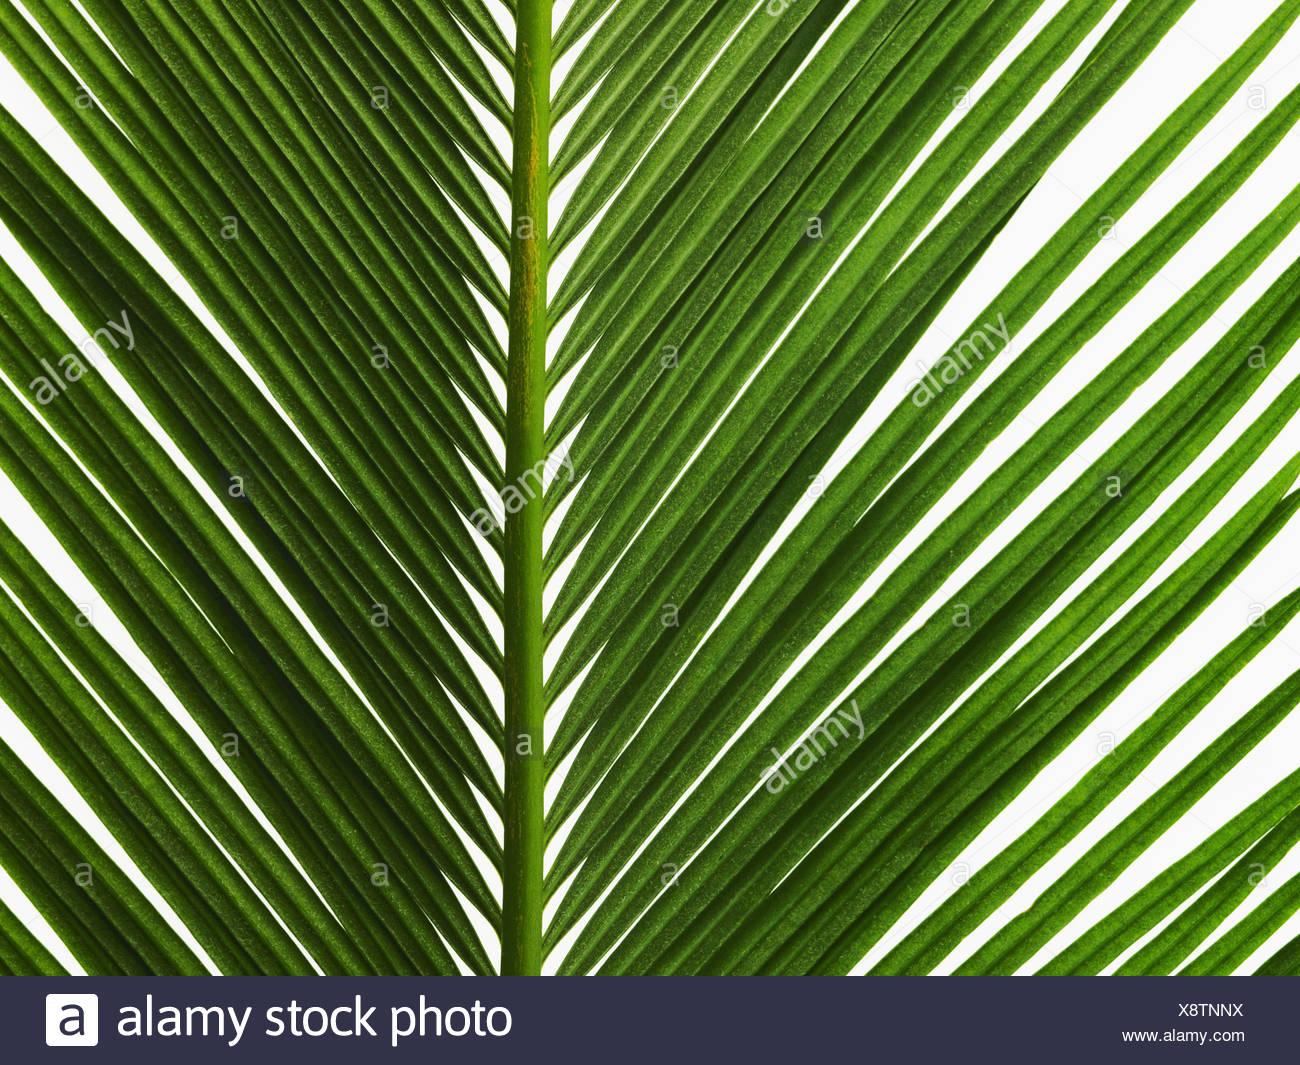 glänzend grüne Palmblatt hautnah mit Mittelrippe Stockbild